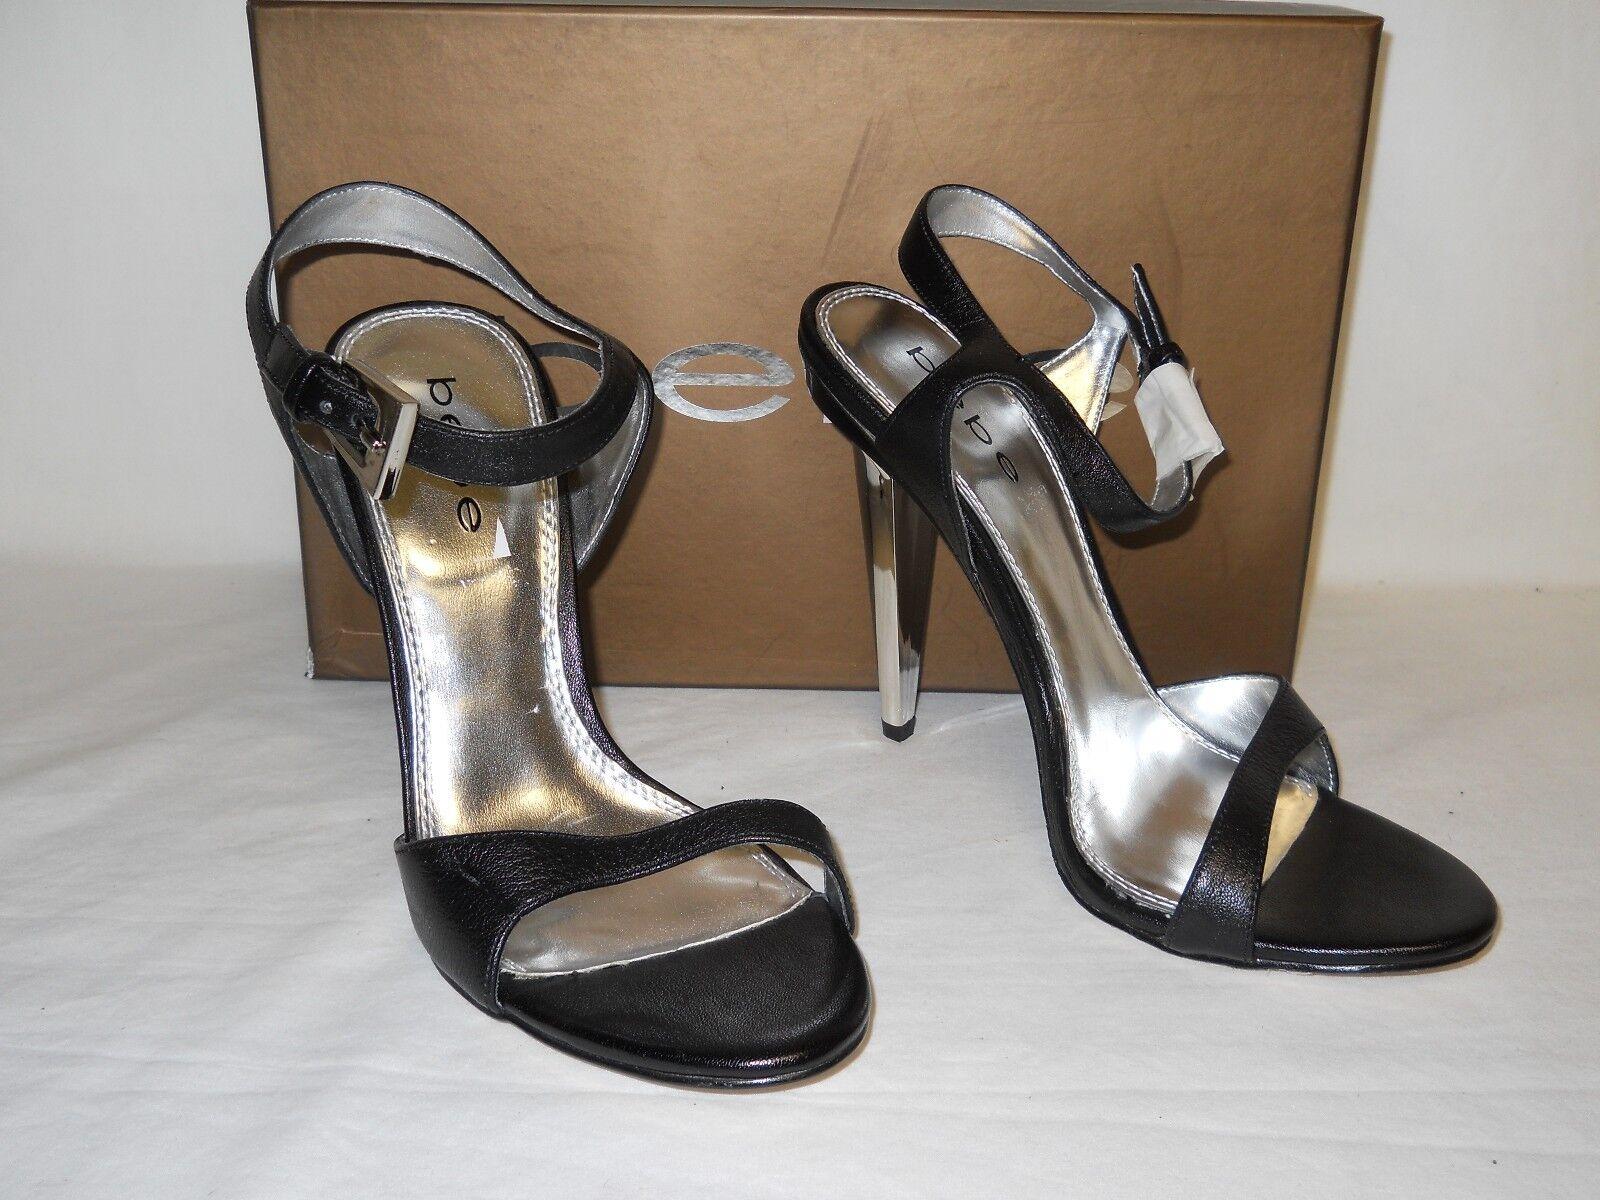 Bebe New Womens Socorro Black Leather Sandals 9 M shoes NWB